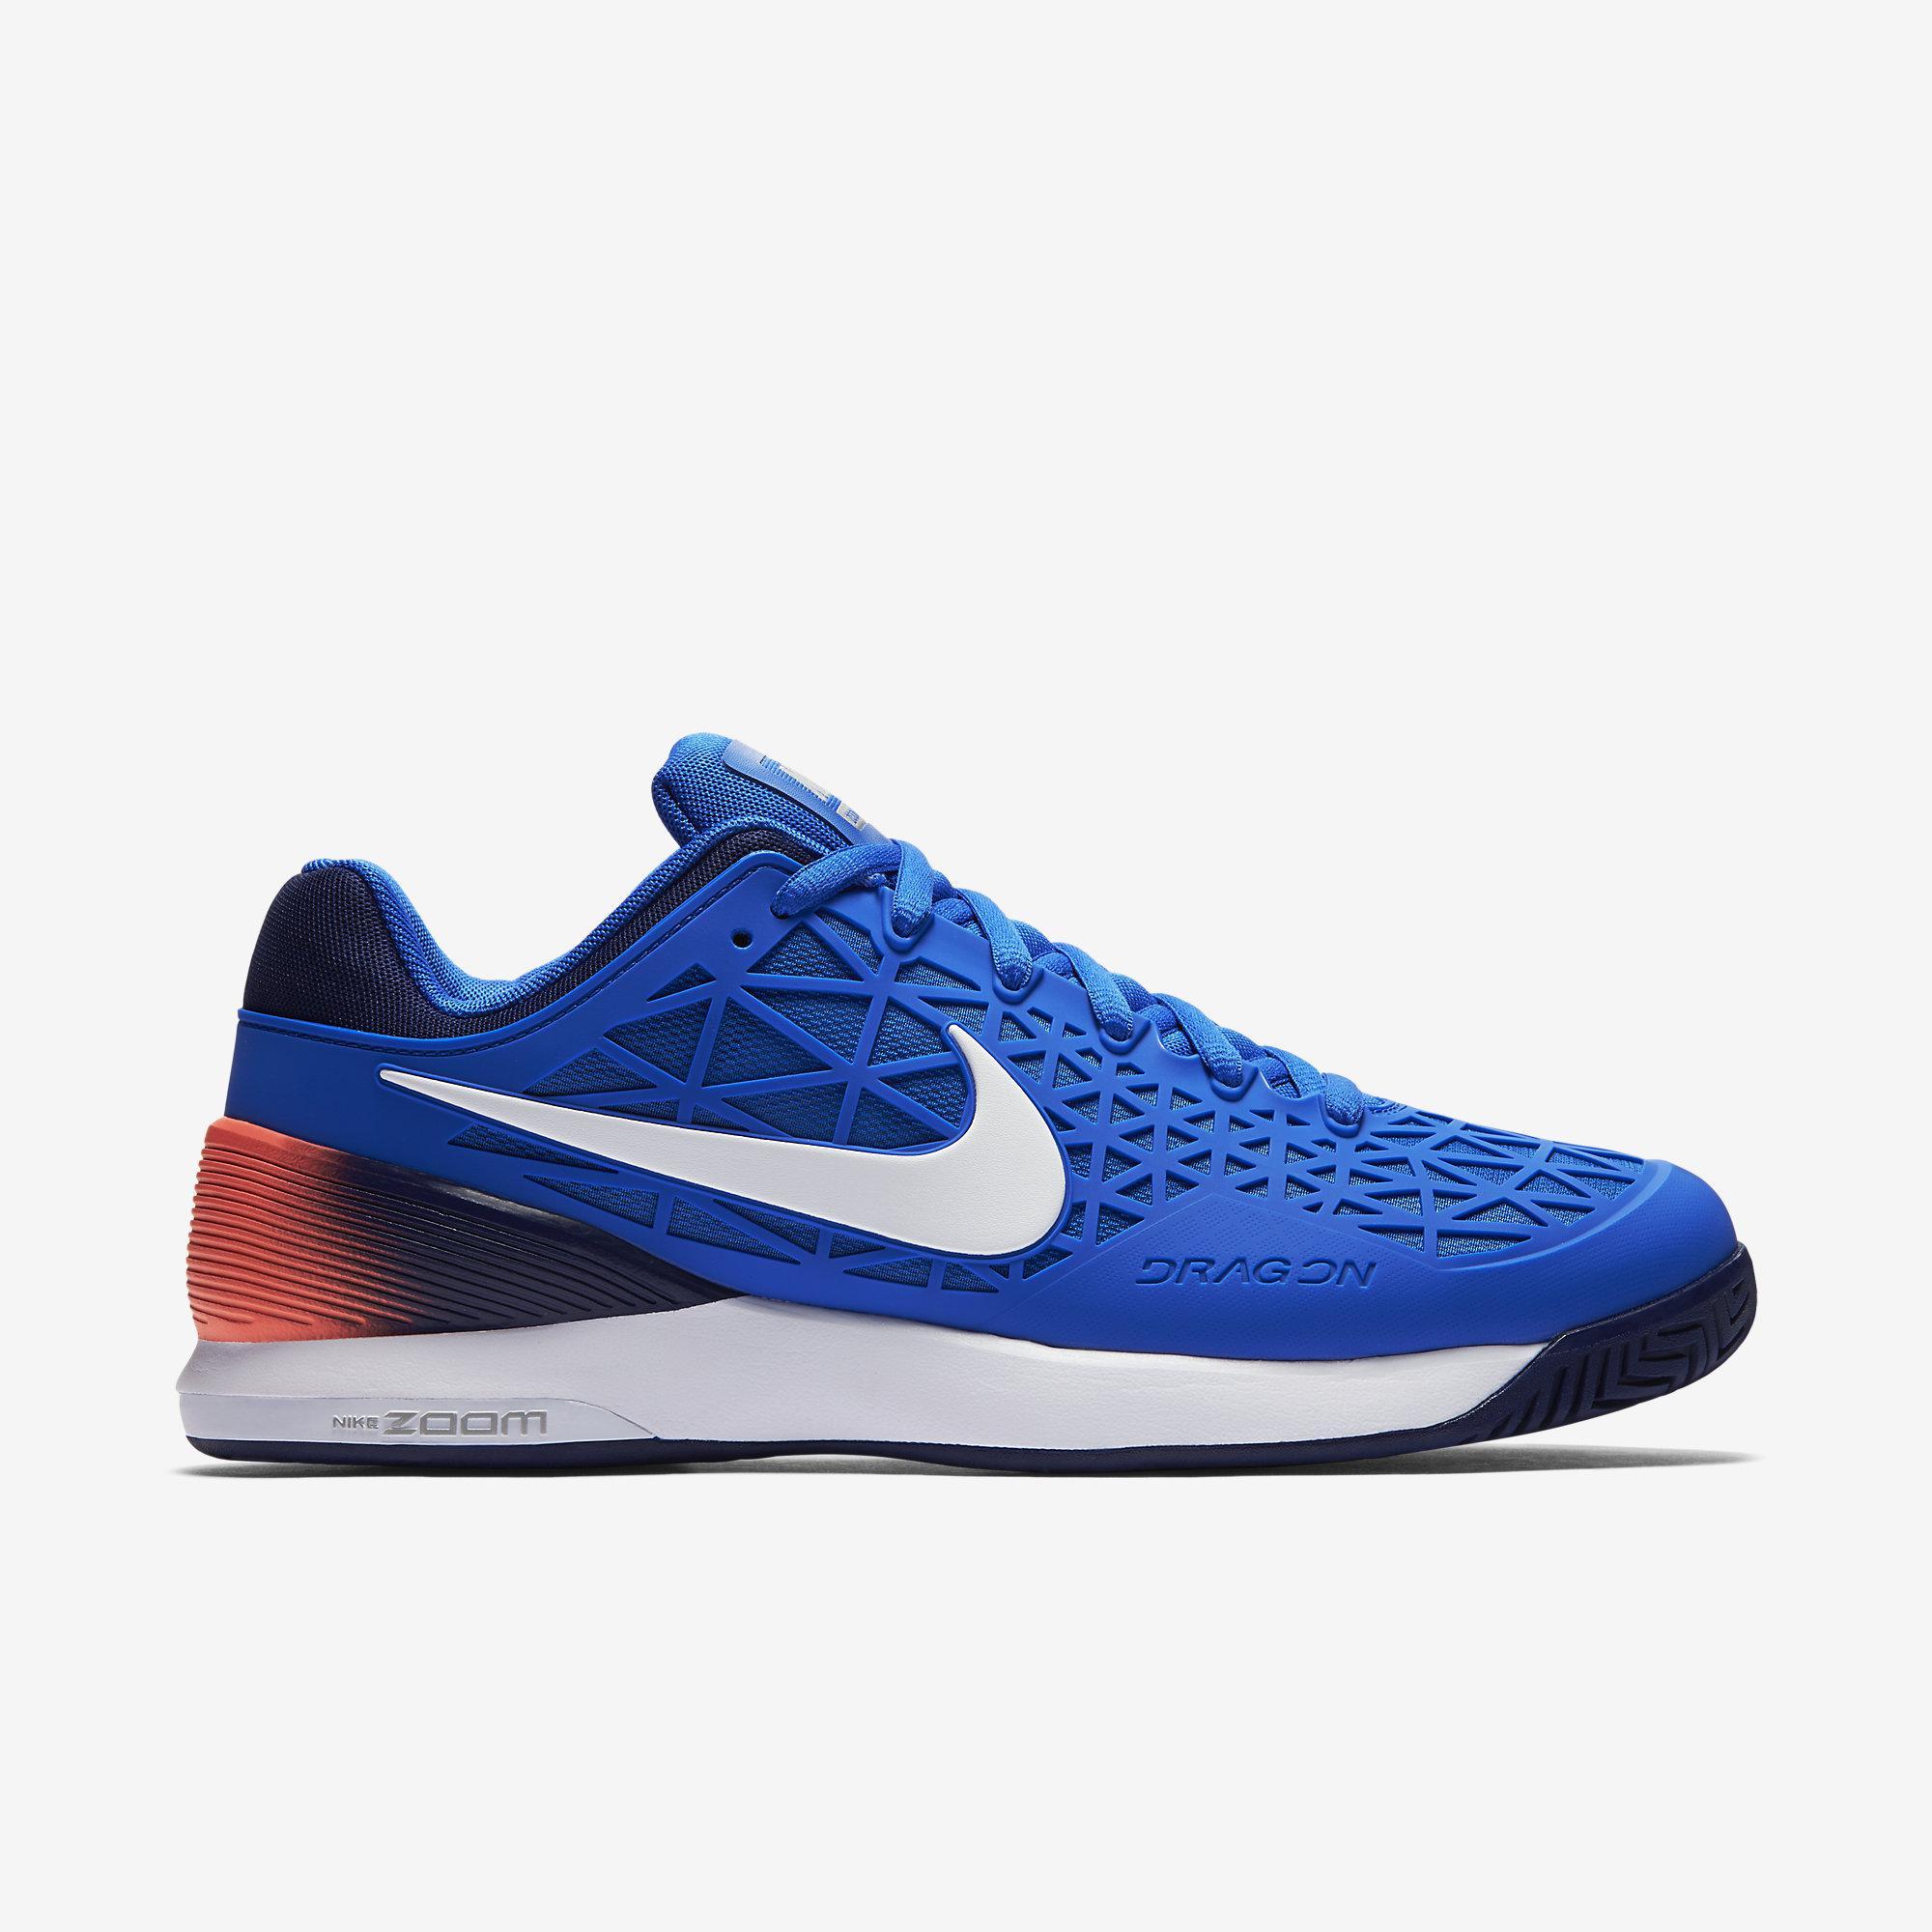 Nike Mens Zoom Cage 2 EU Tennis Shoes  Blue  Tennisnutscom